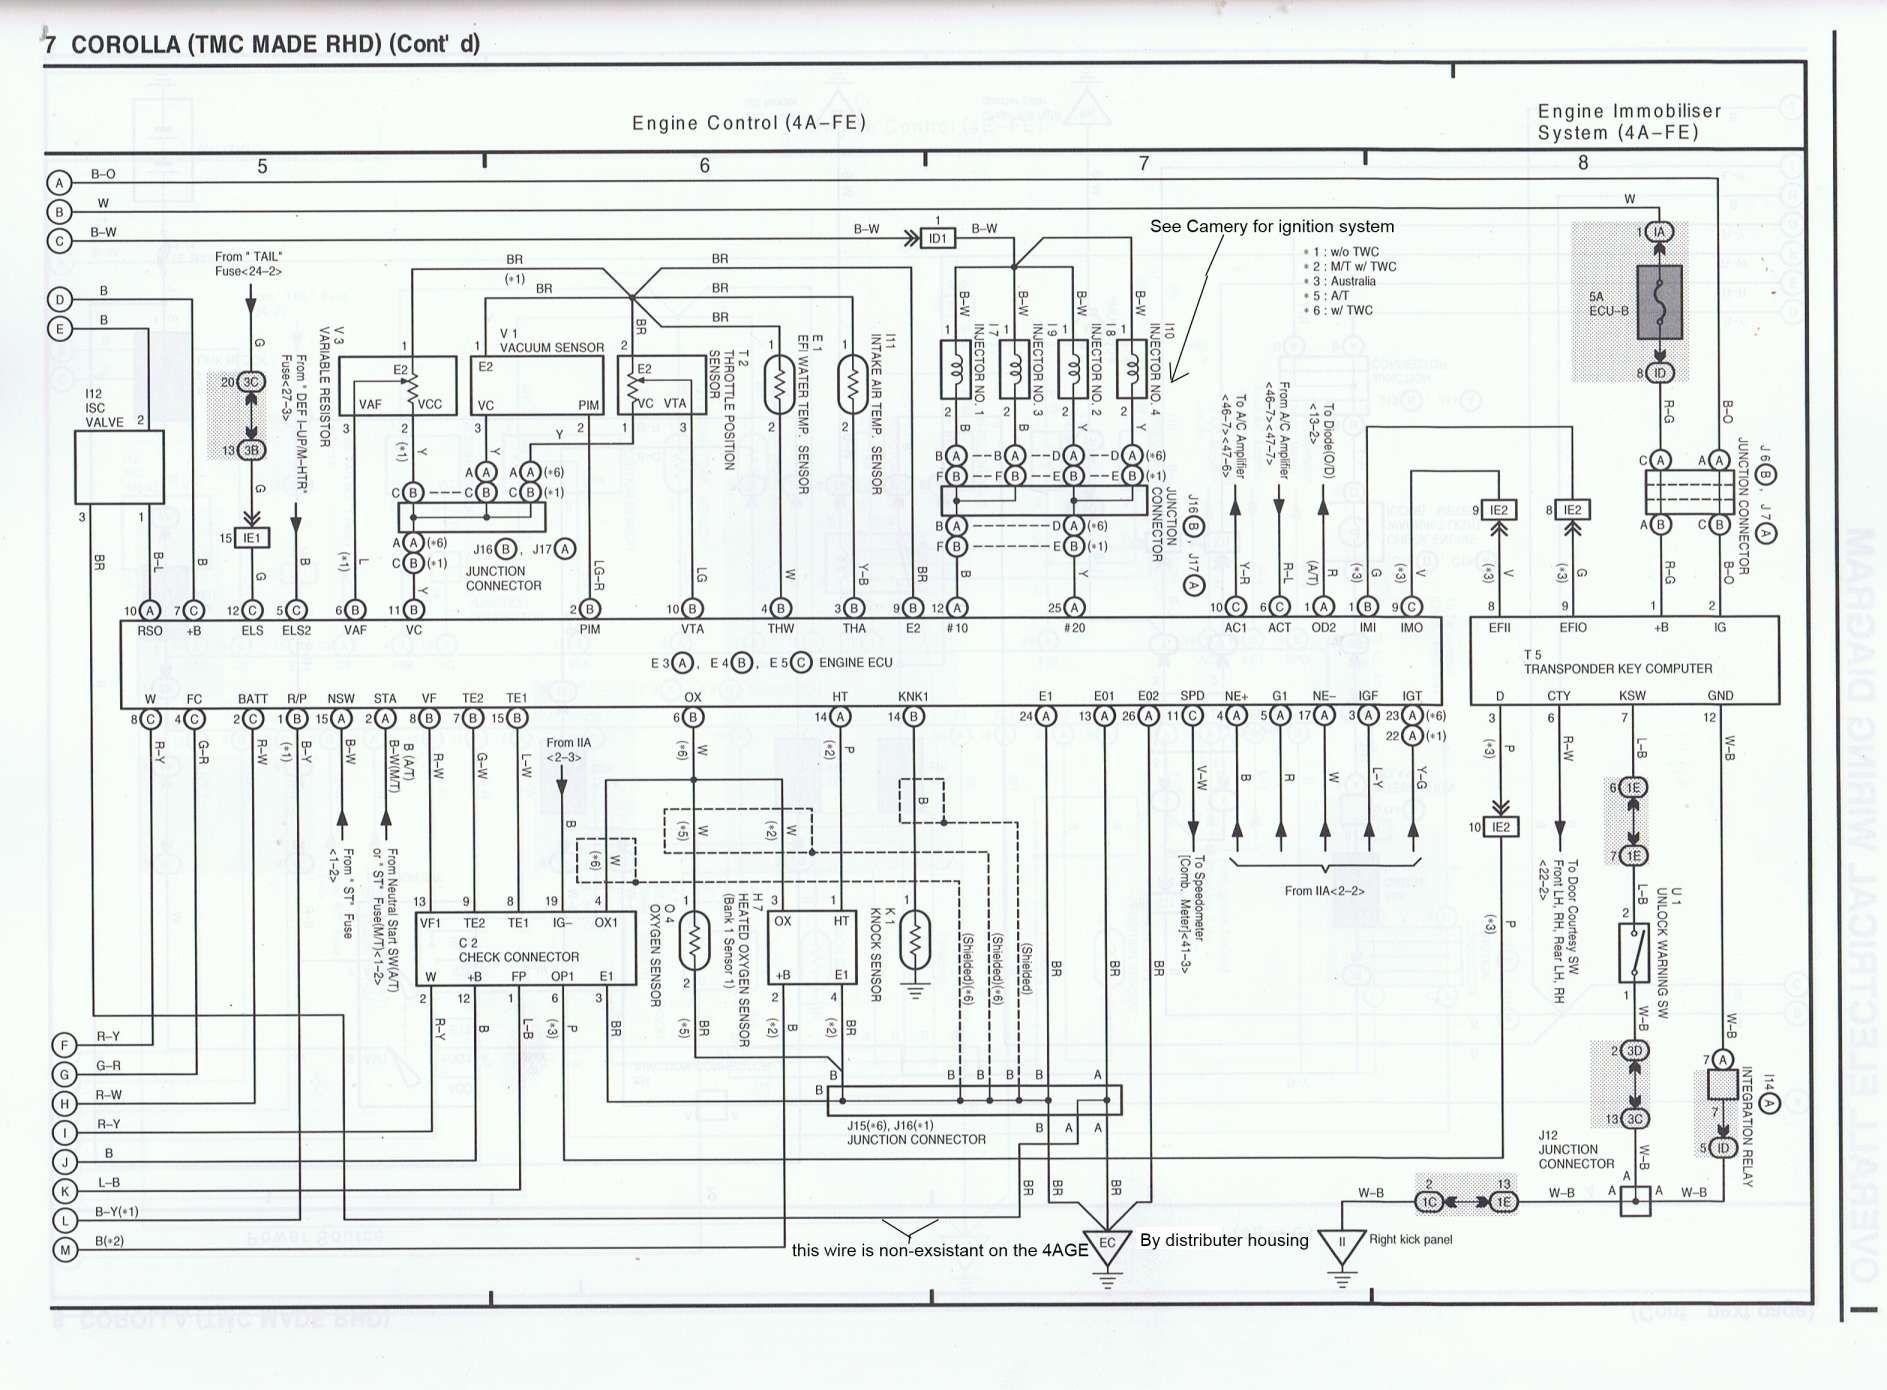 18 Toyota 4age Engine Wiring Diagram Engine Diagram Wiringg Net Diagram Electrical Wiring Diagram Engineering